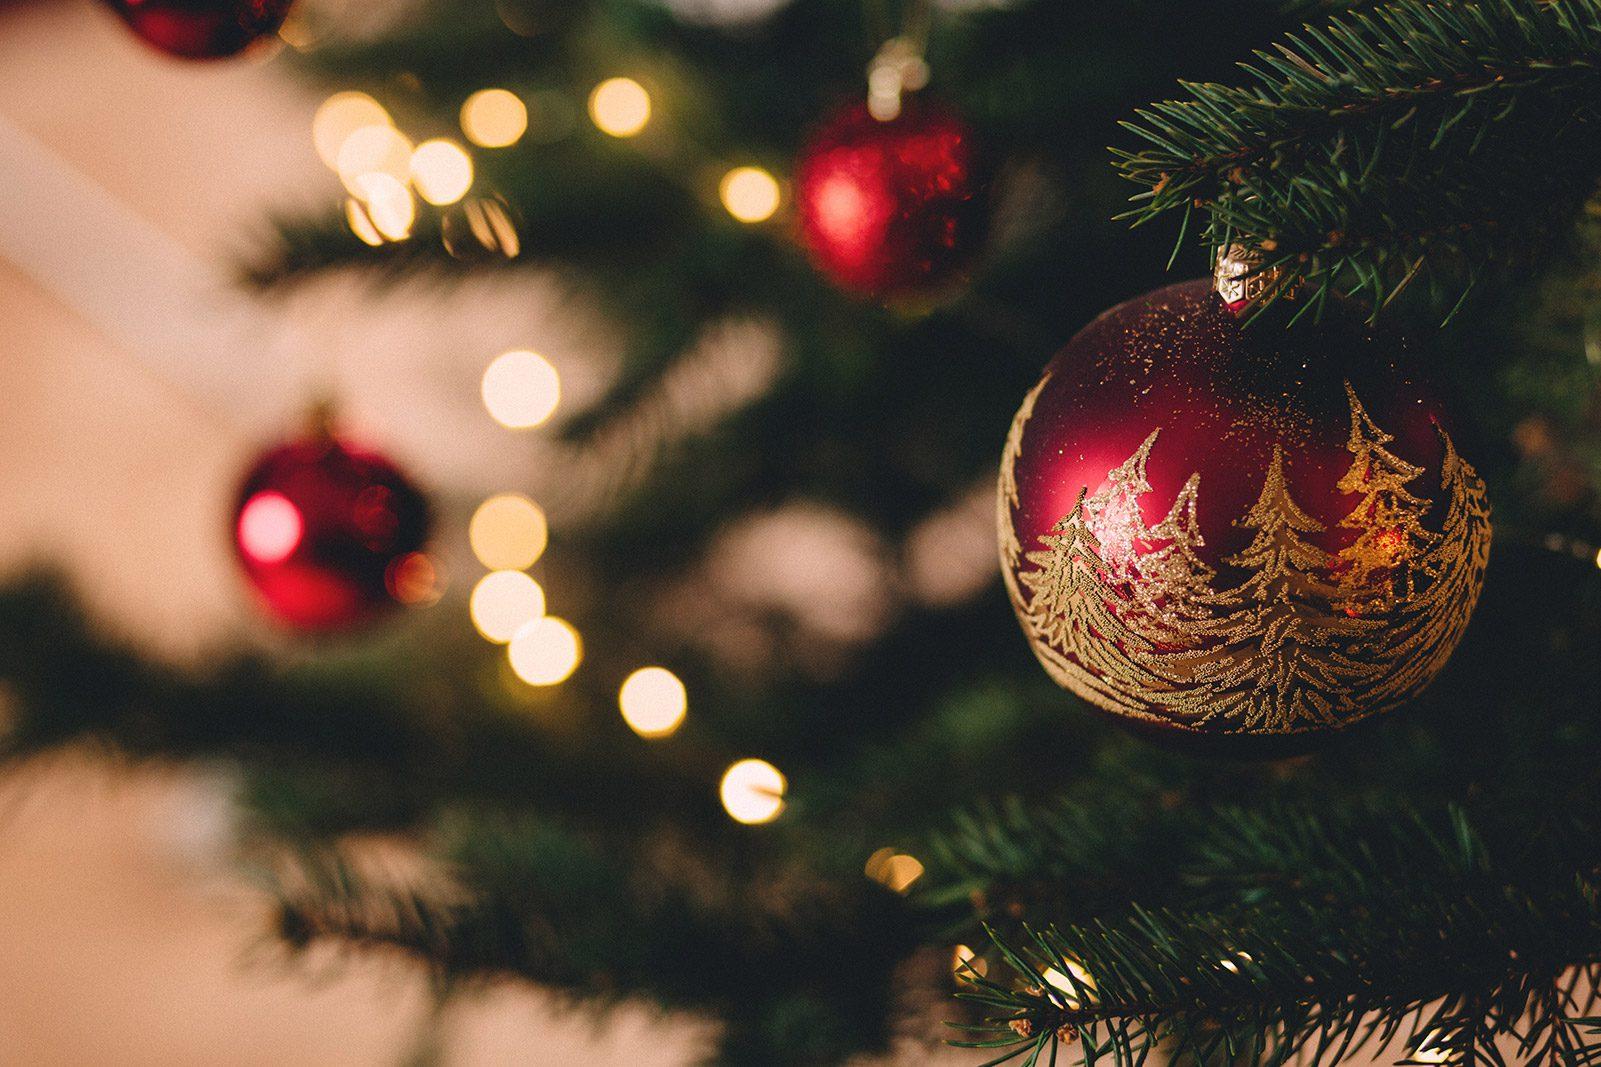 Billetter til juletræsfesten 2019